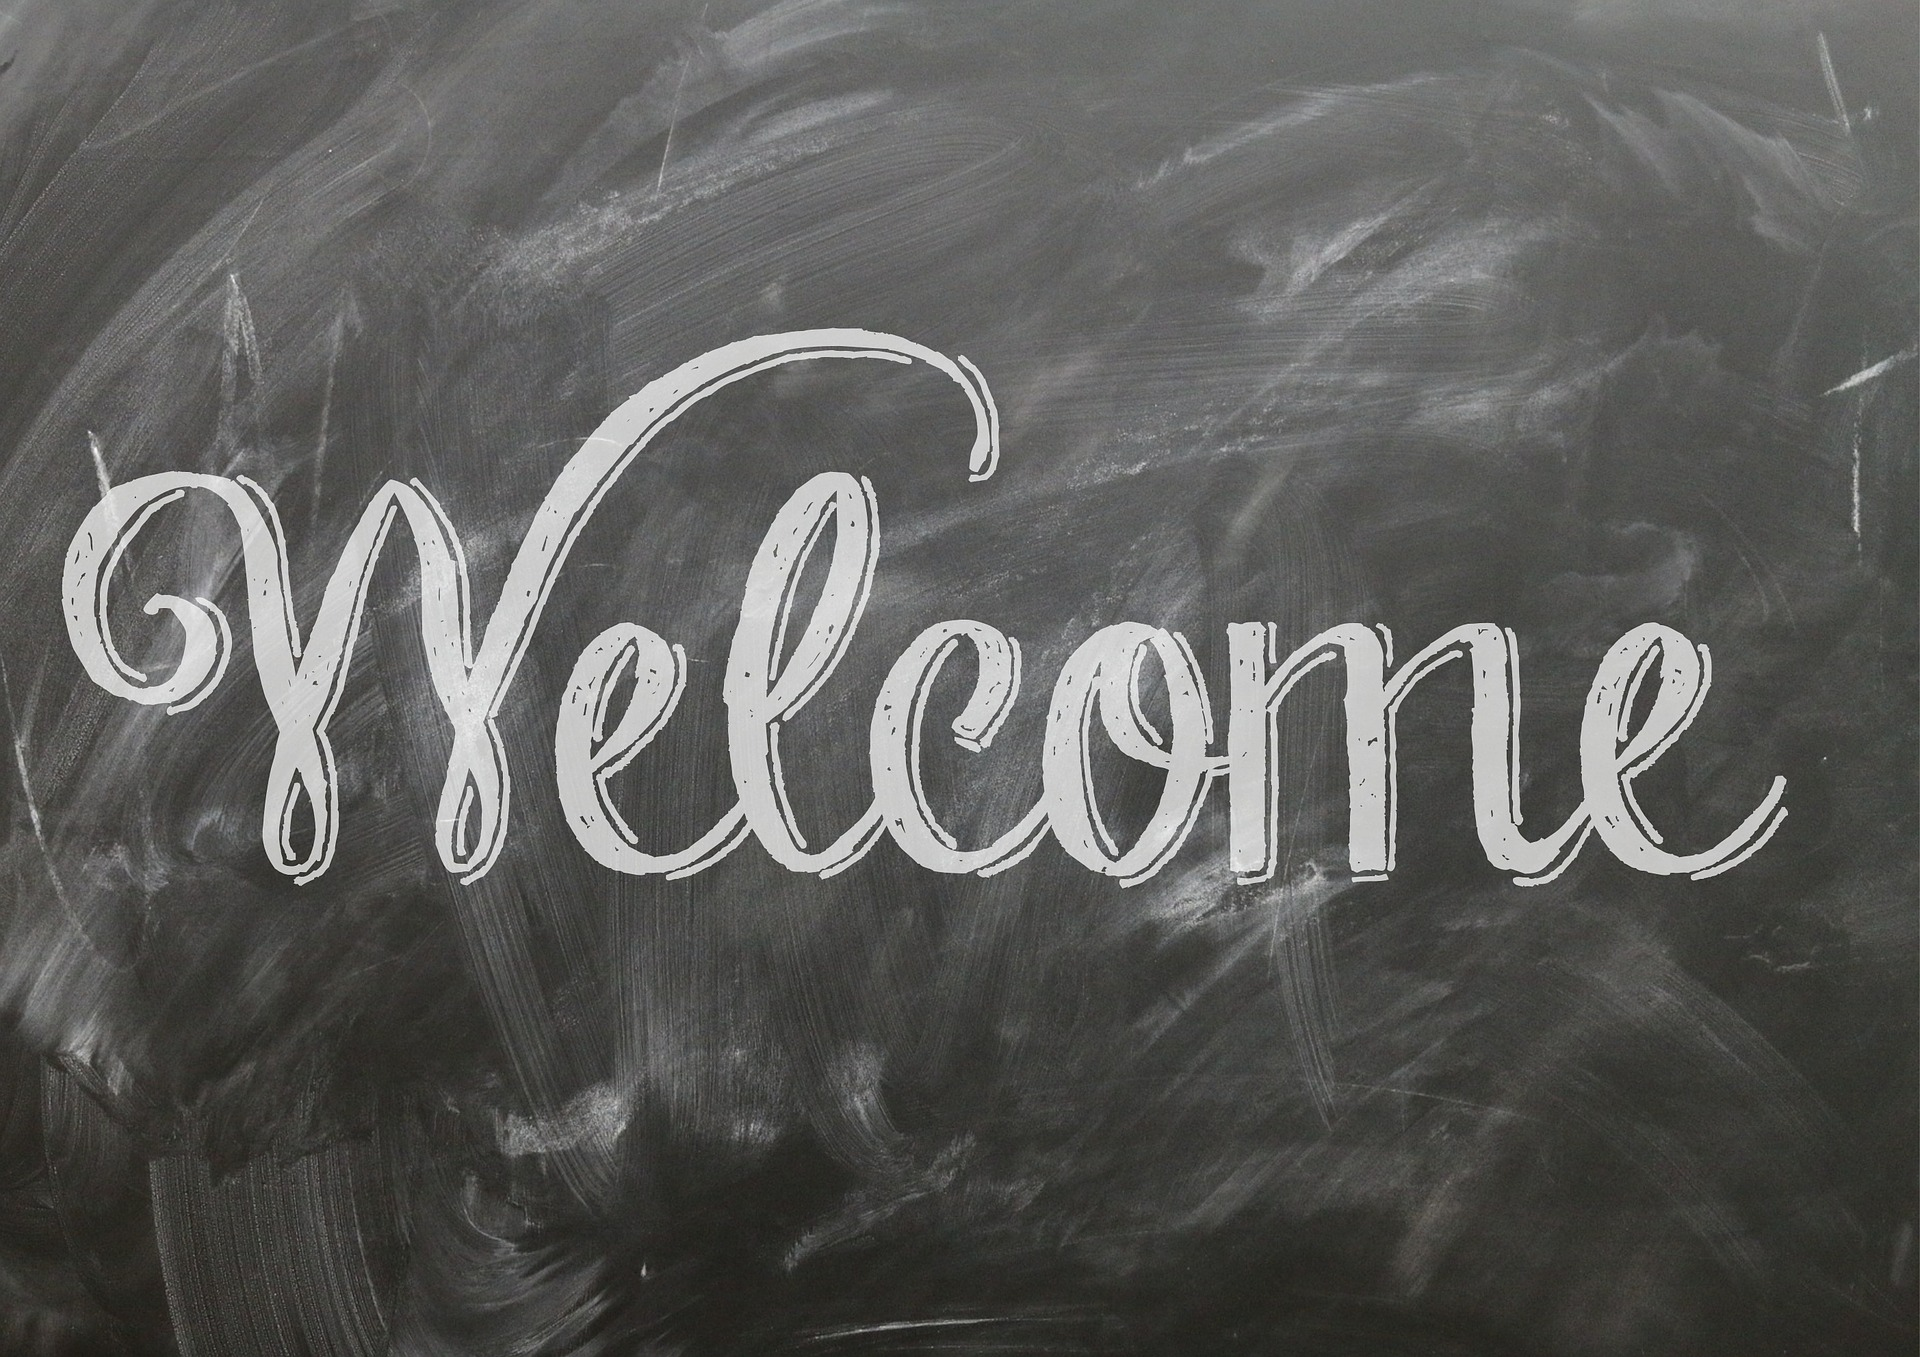 Welcome to ackermann International